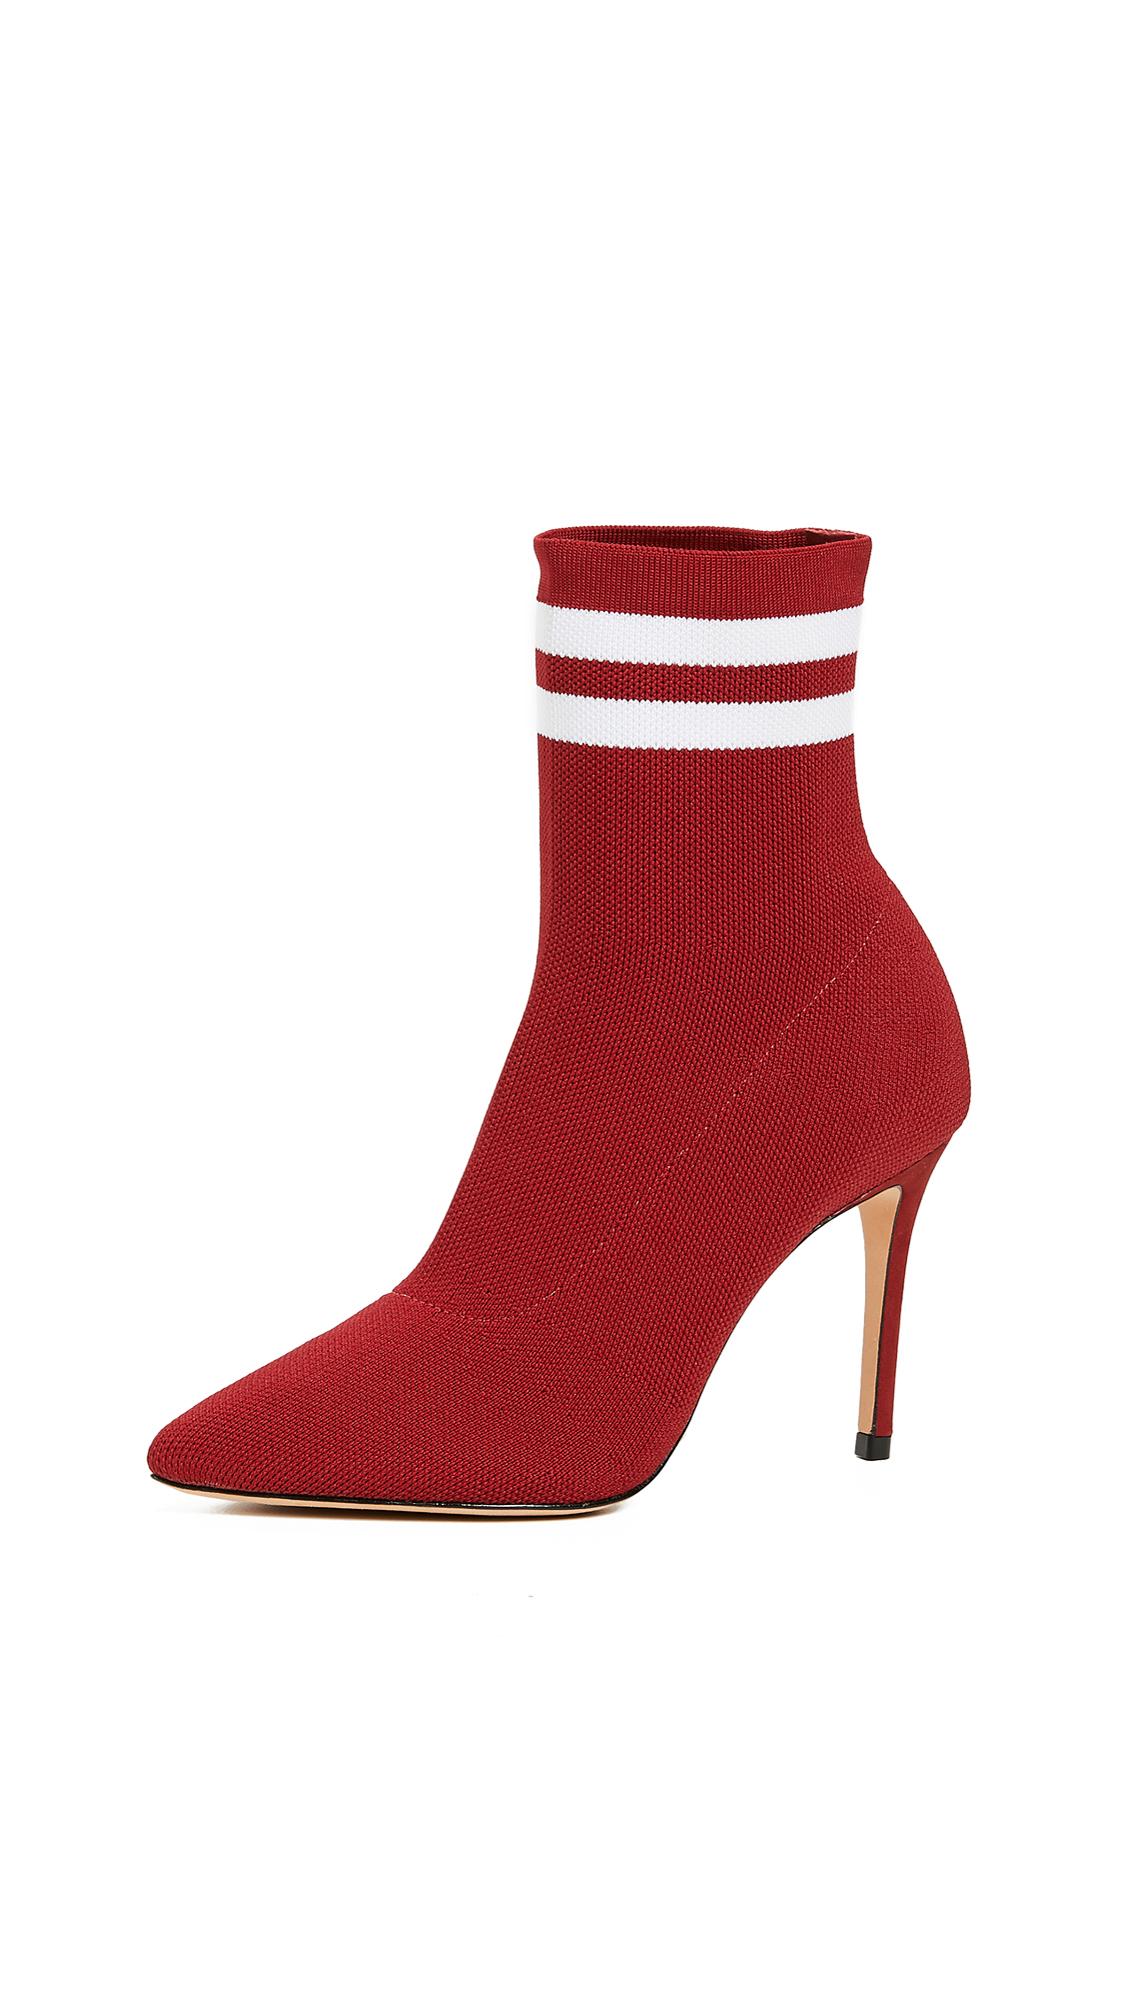 Schutz Gisela Sock Booties - Red